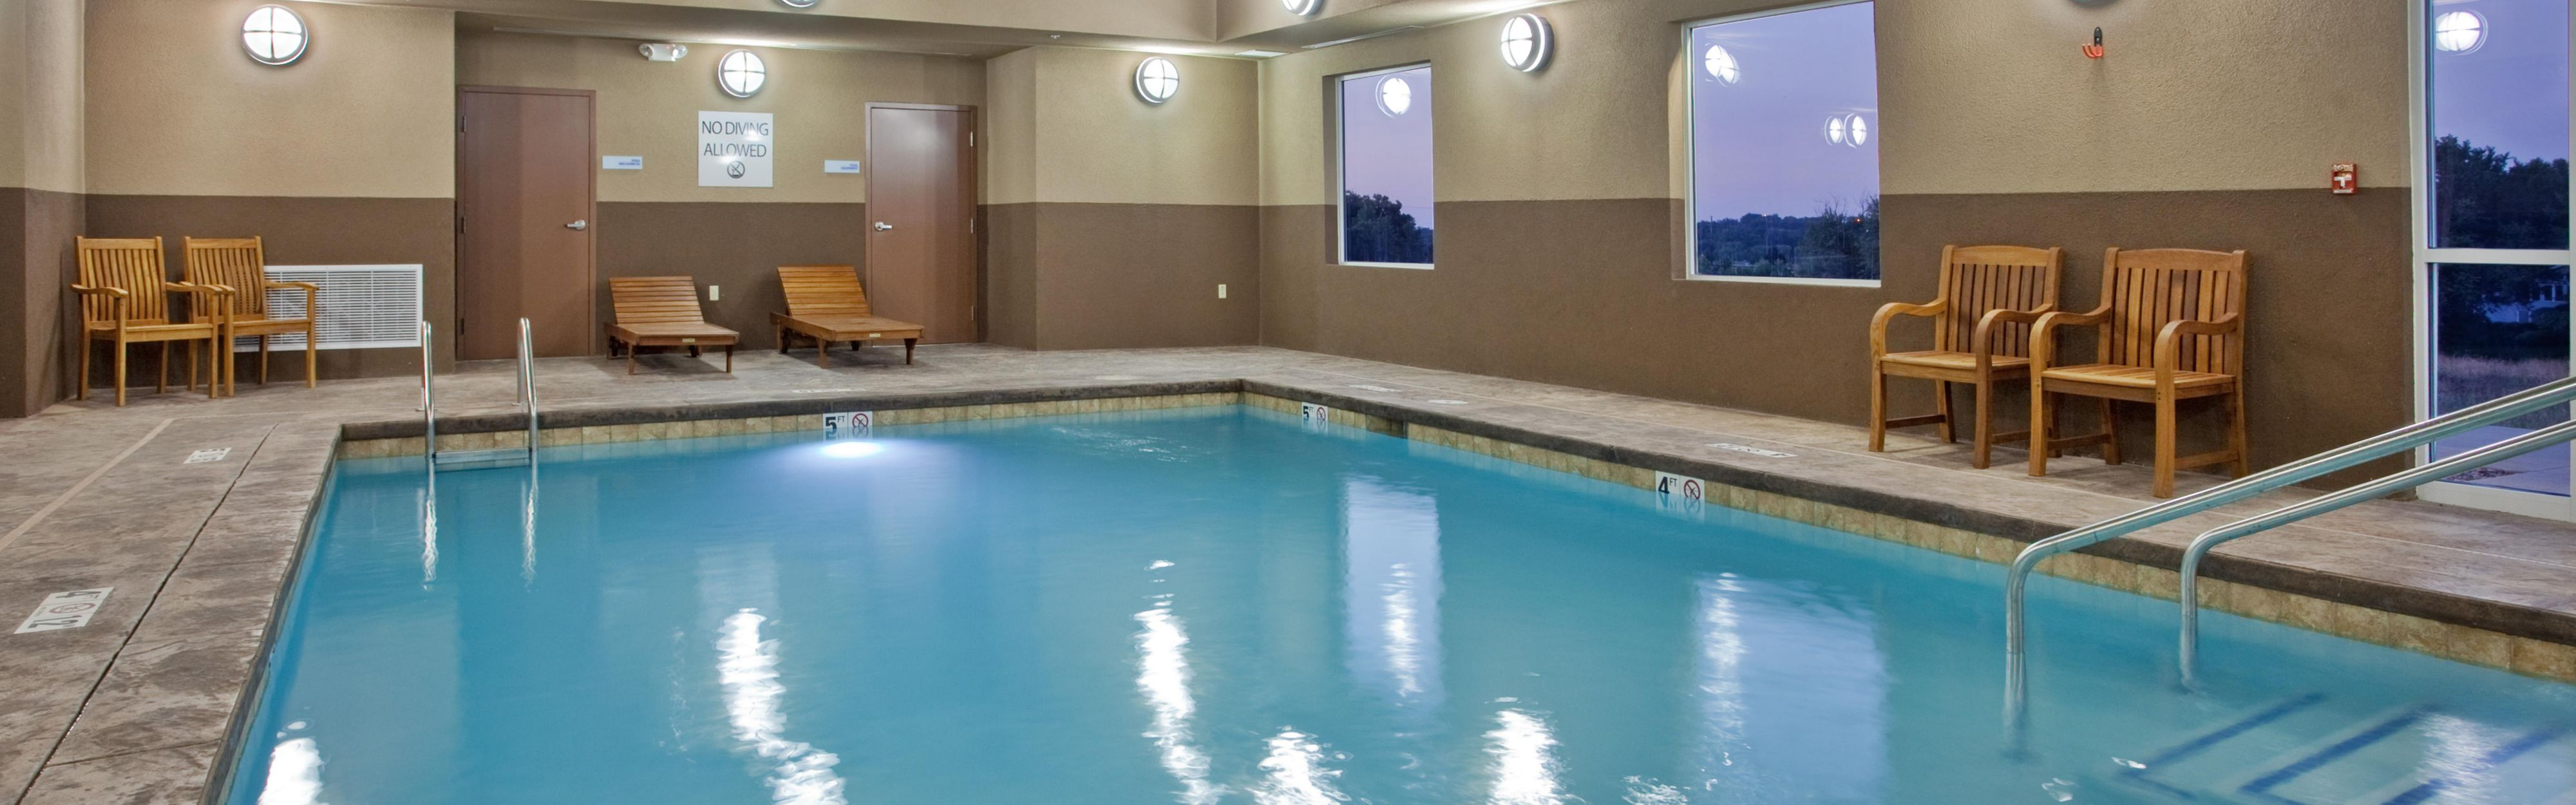 Holiday Inn Express & Suites St. Joseph image 2